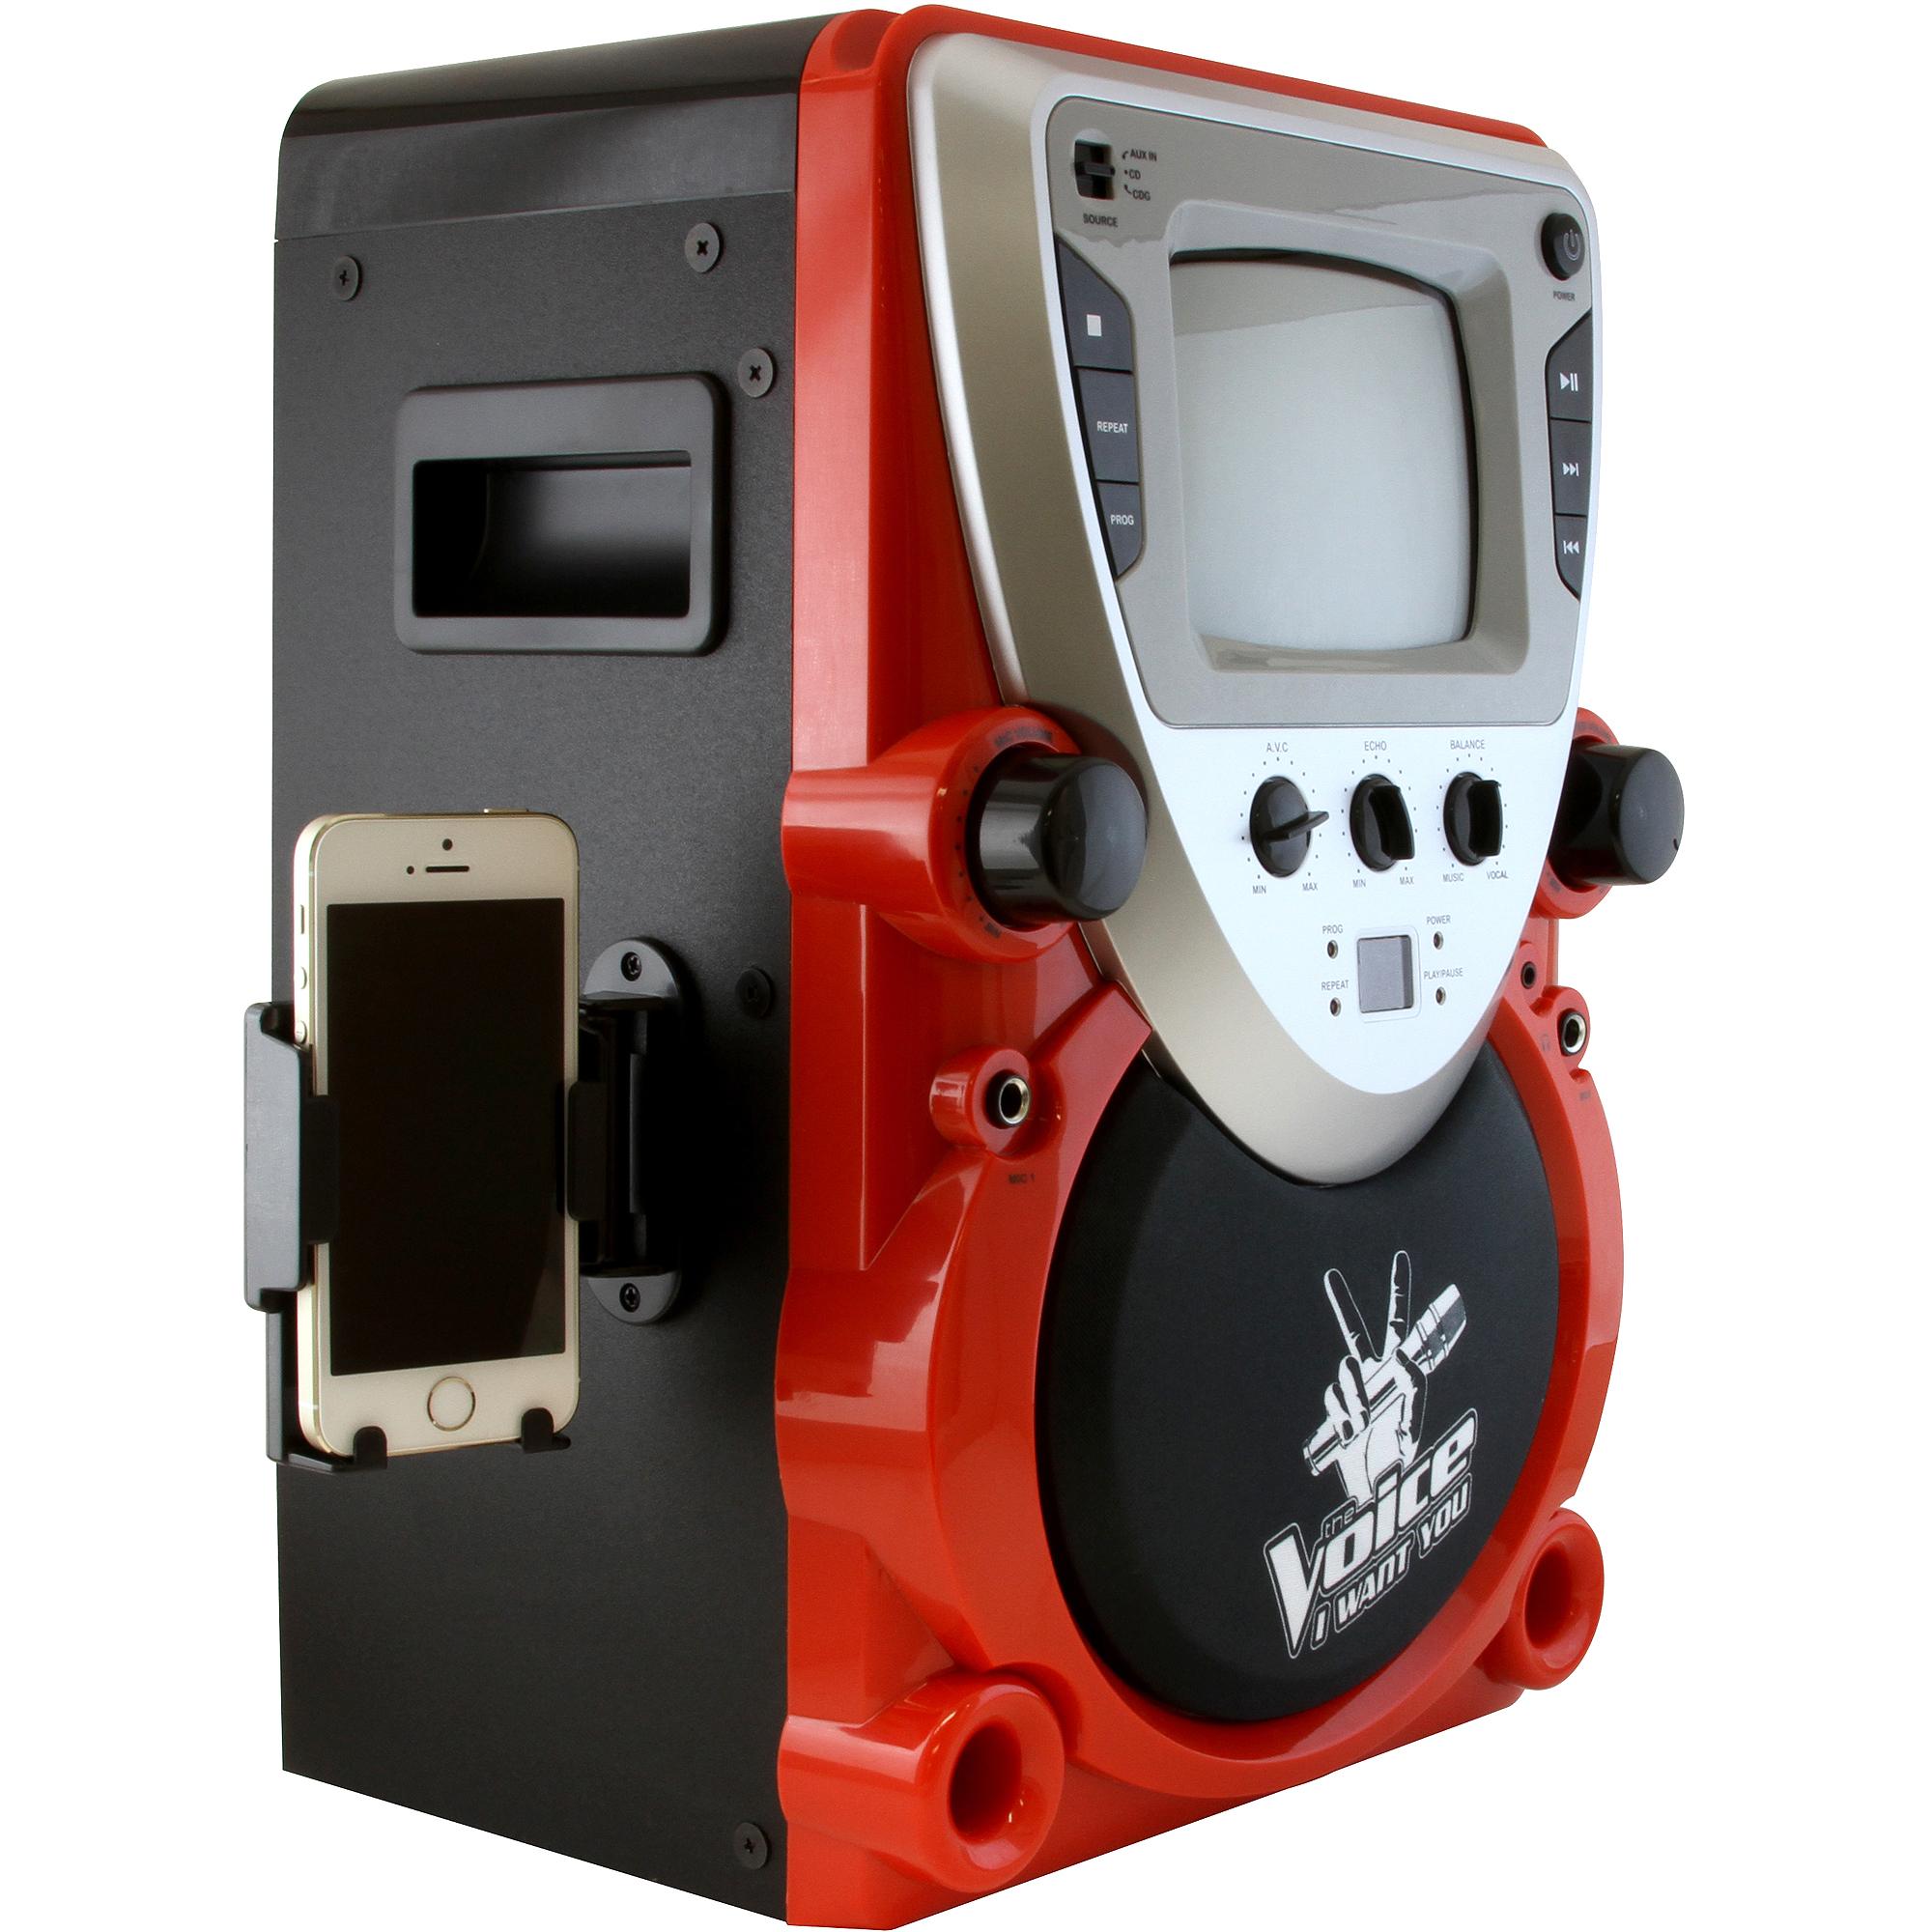 Sakar The Voice KTV2000-WAL CD Karaoke System with Screen